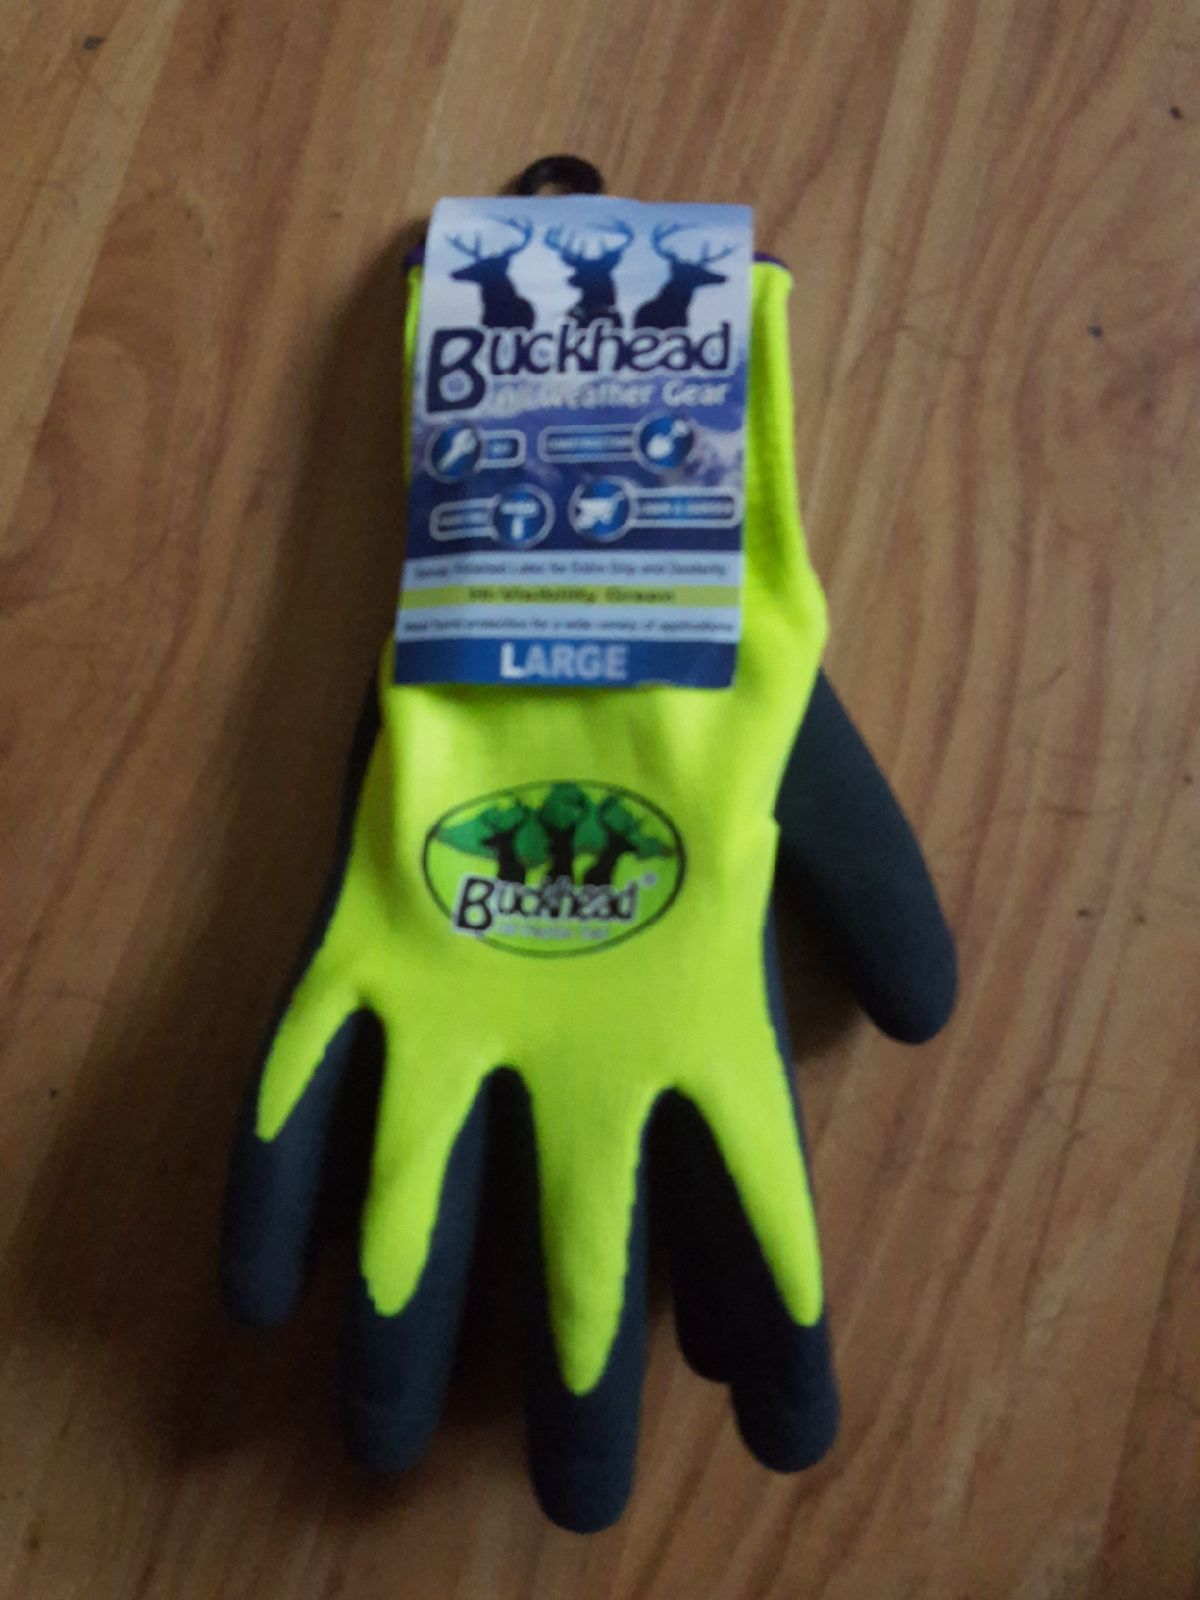 New Buckhead All Weather Gear gloves